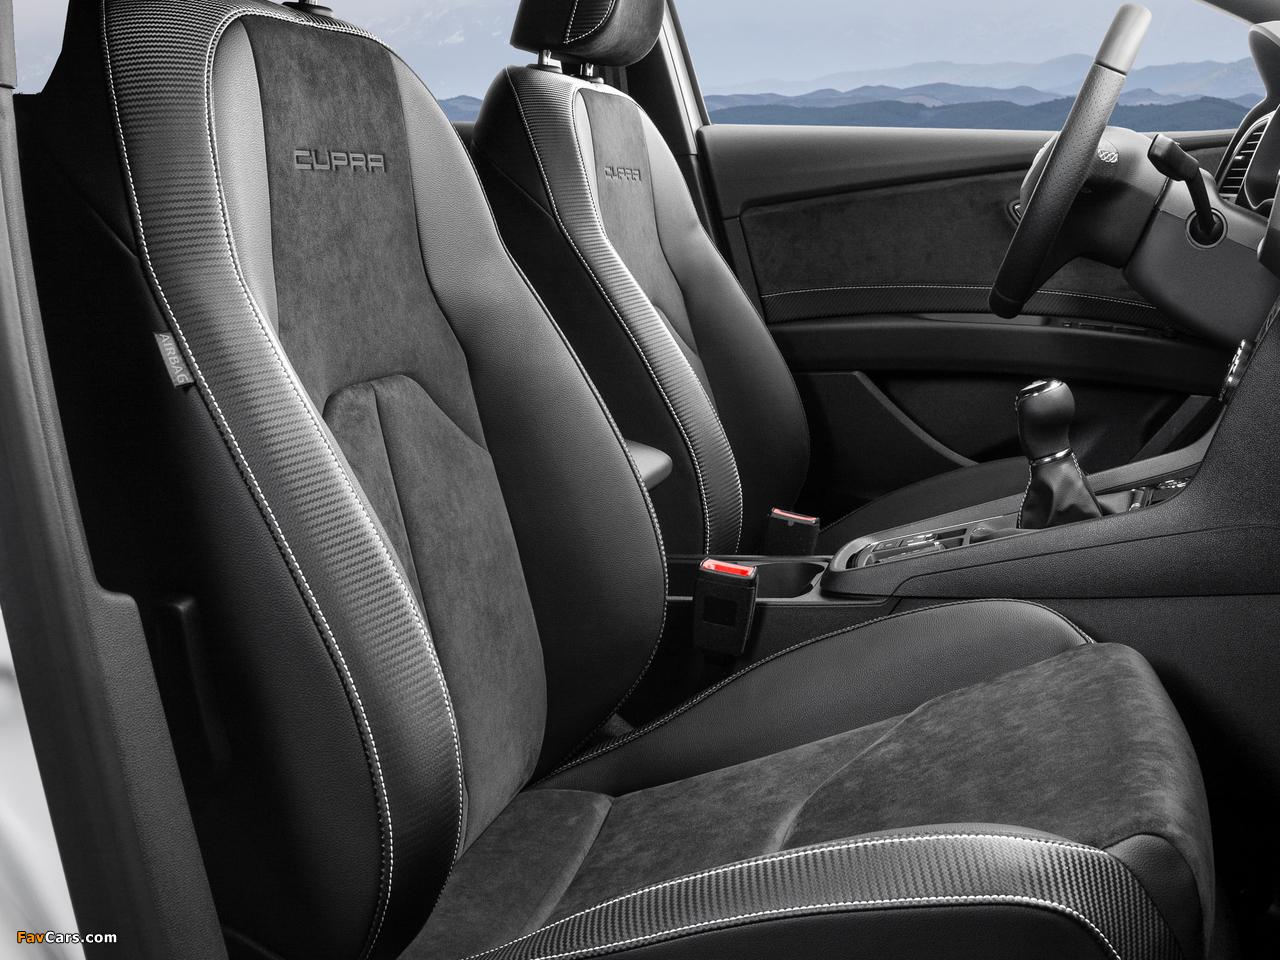 Seat León ST Cupra 300 (5F) 2017 pictures (1280 x 960)